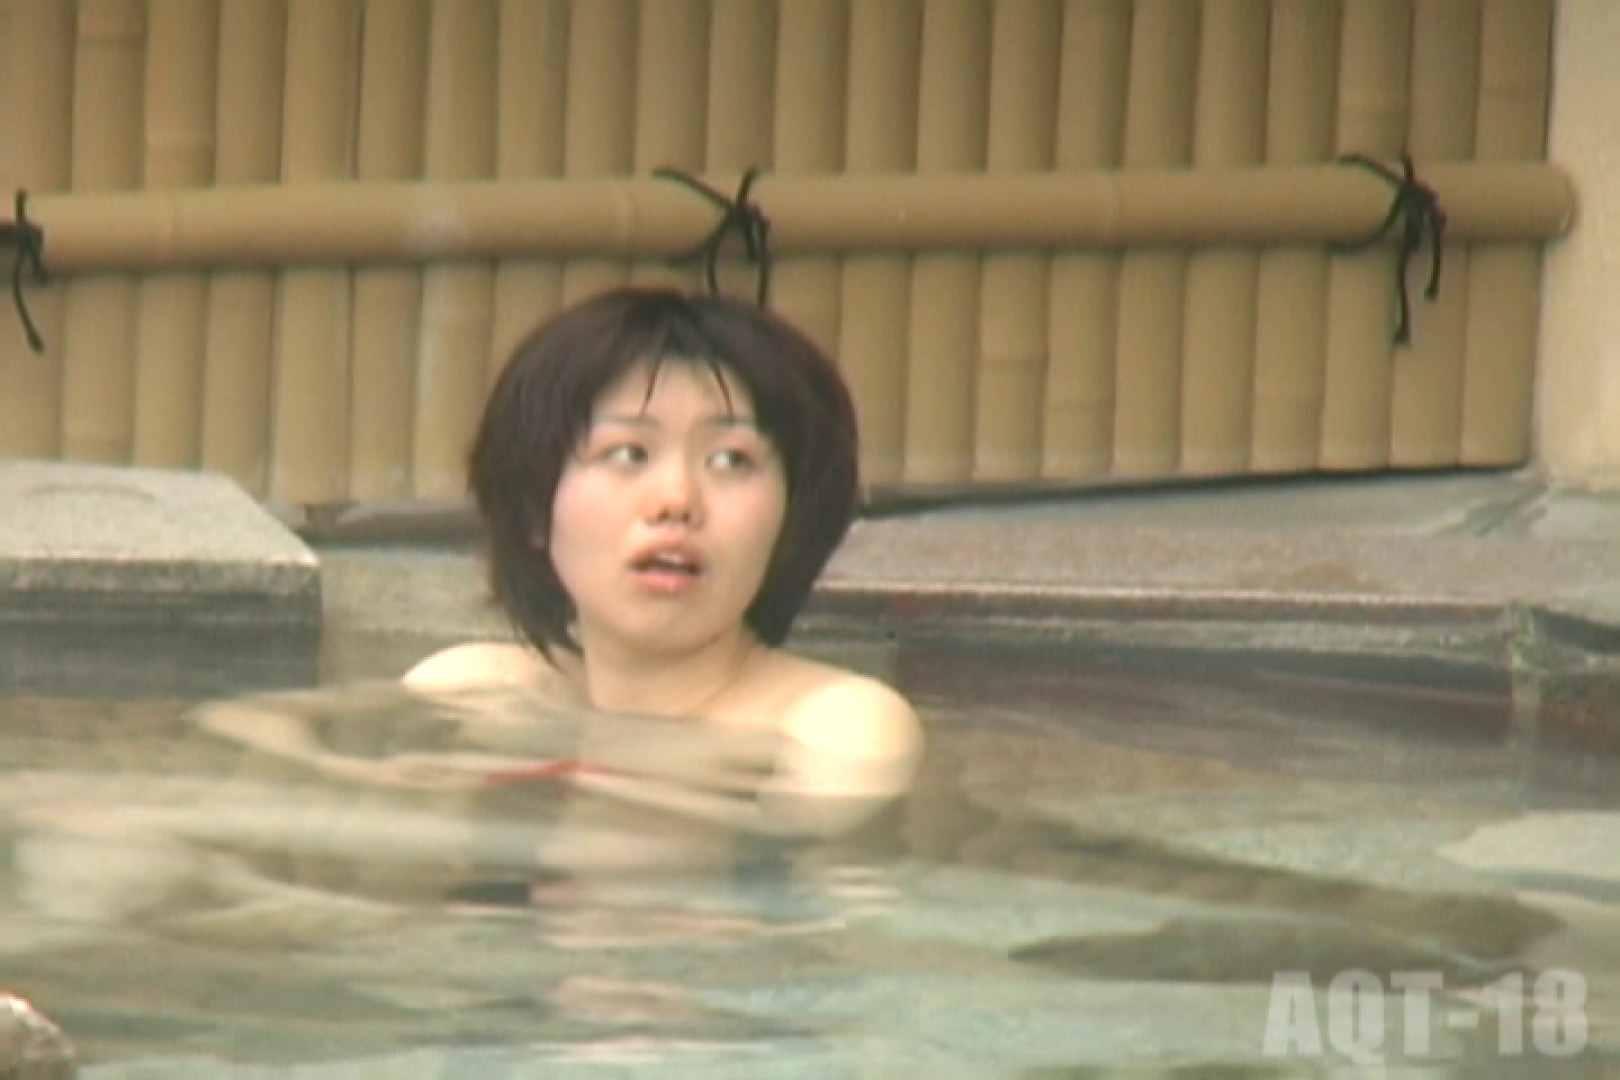 Aquaな露天風呂Vol.861 0  87連発 4